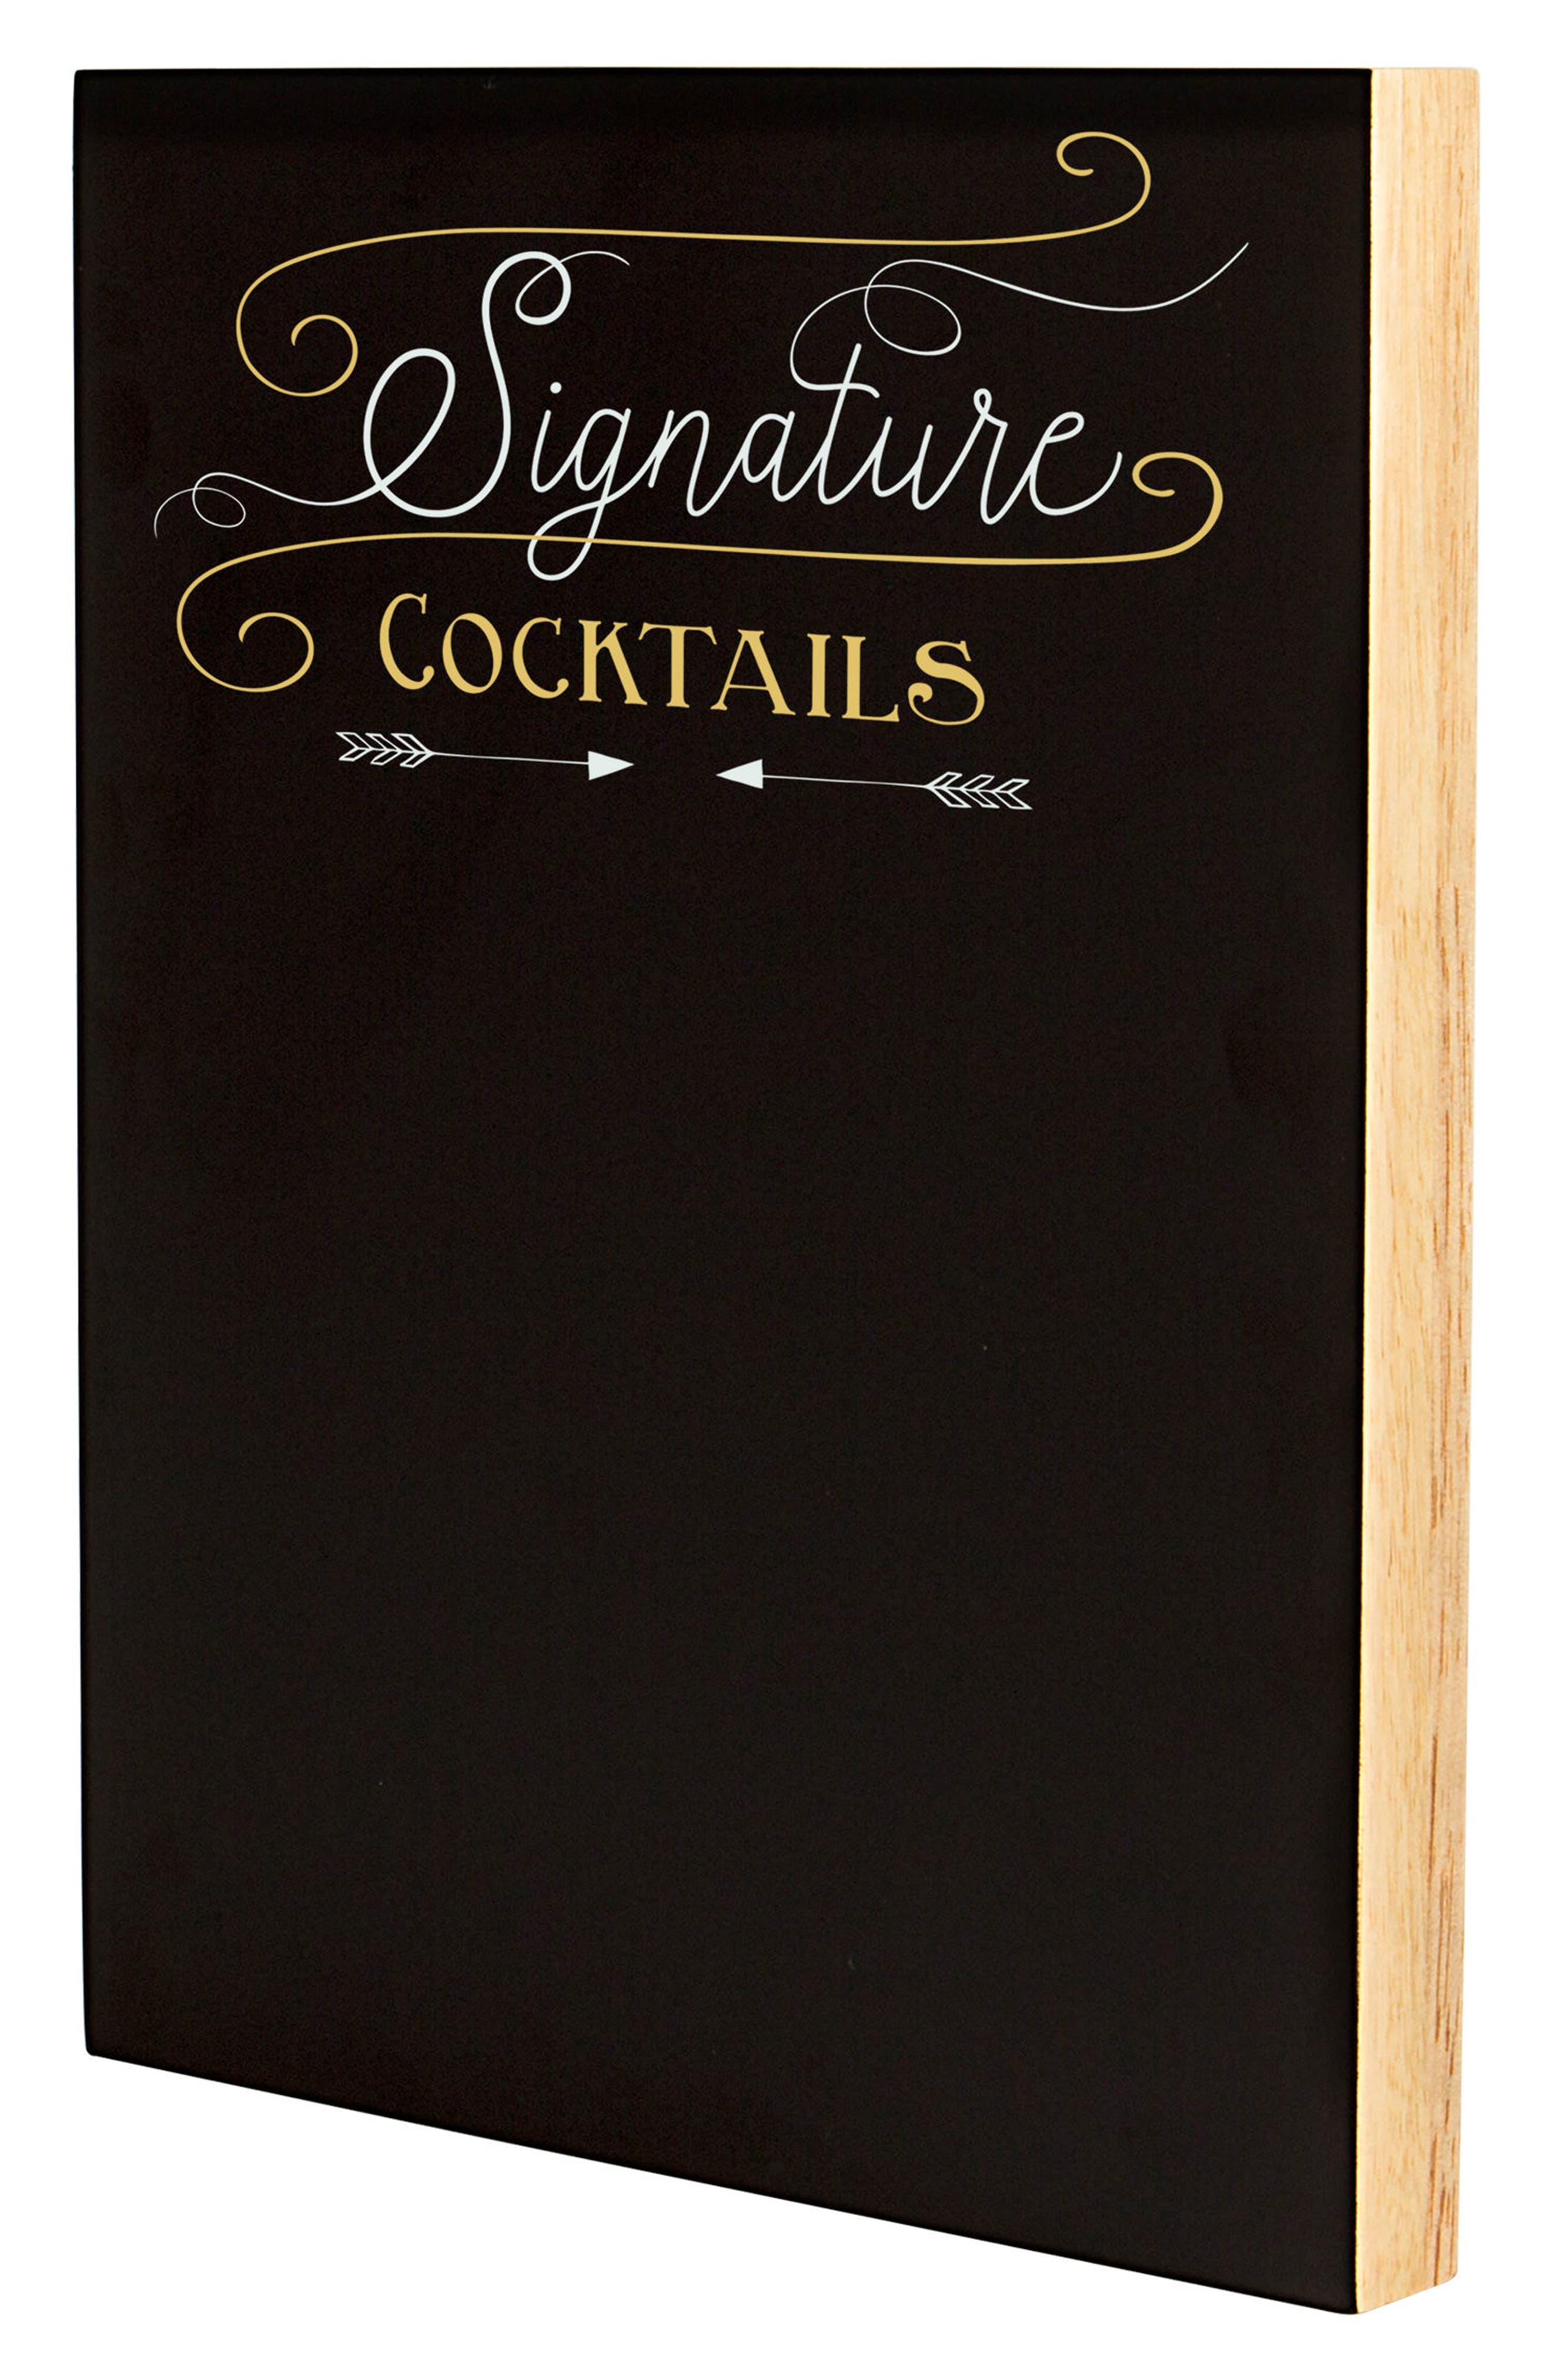 Cocktail Menu Chalkboard Sign,                             Alternate thumbnail 6, color,                             001